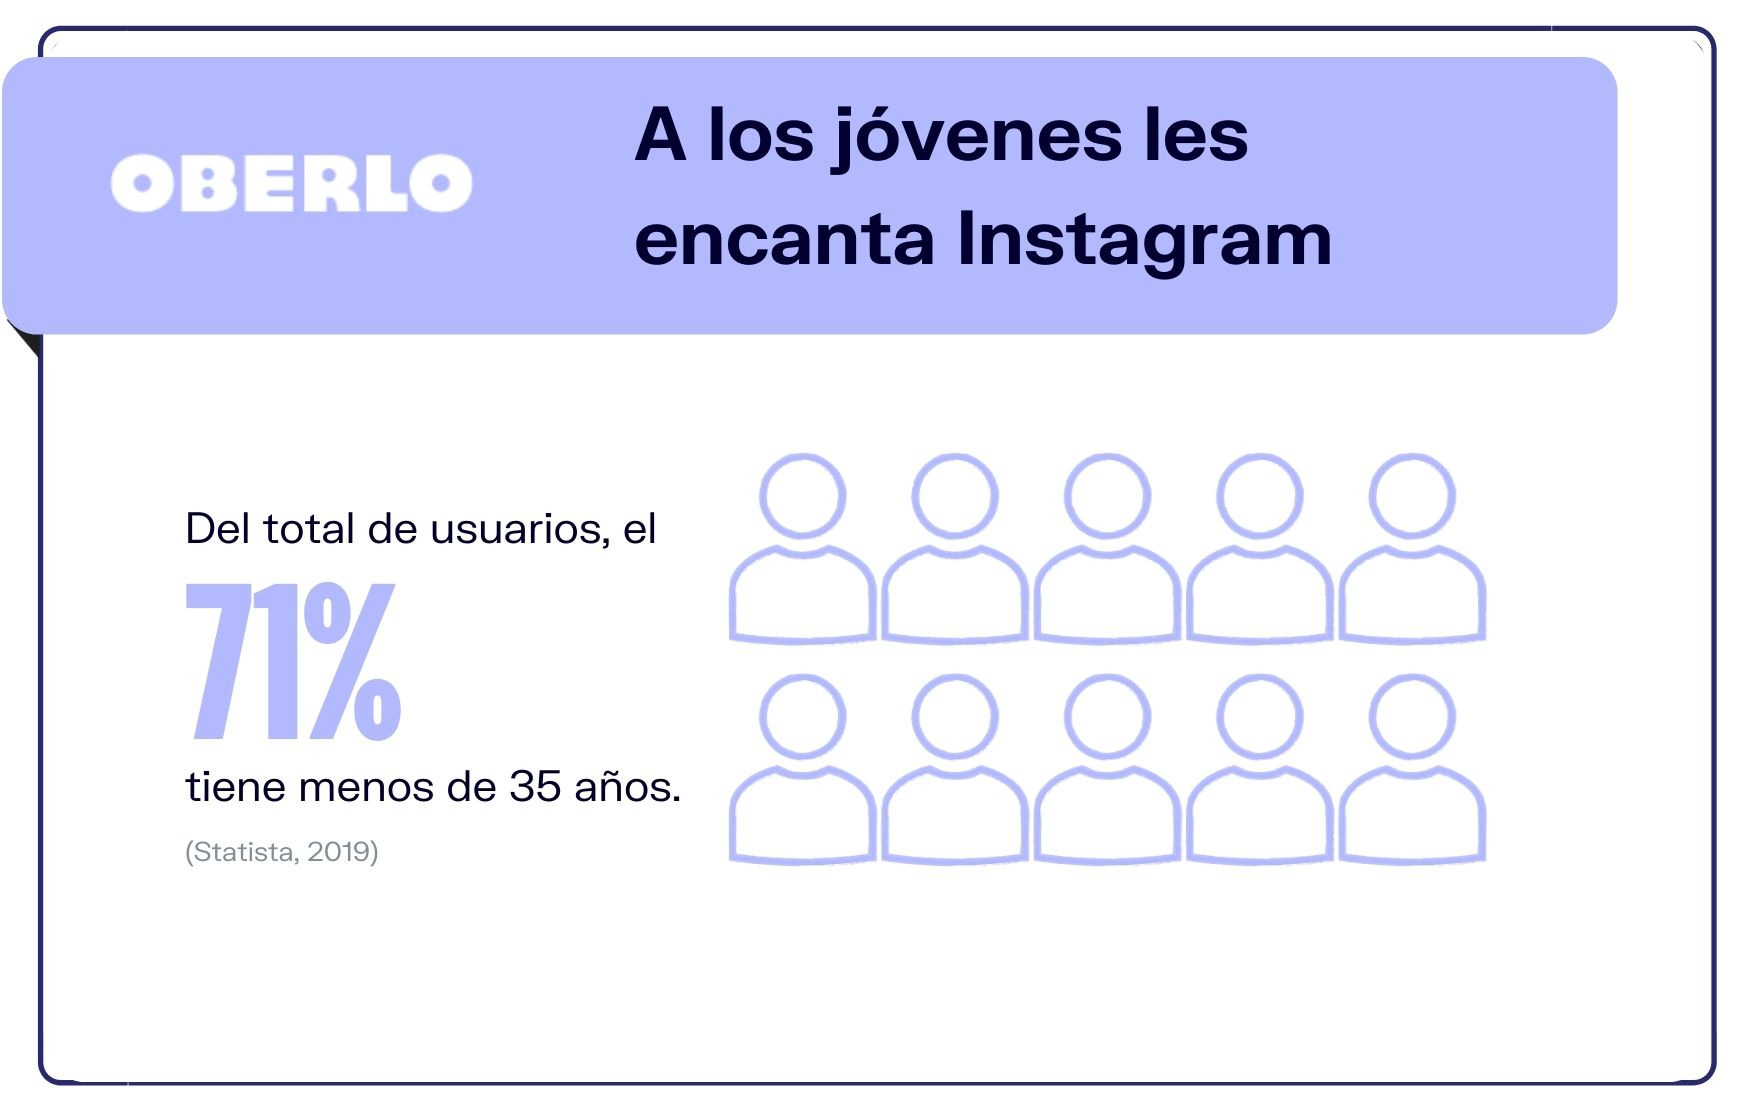 Demografia de Instagram: Instagram demográfico